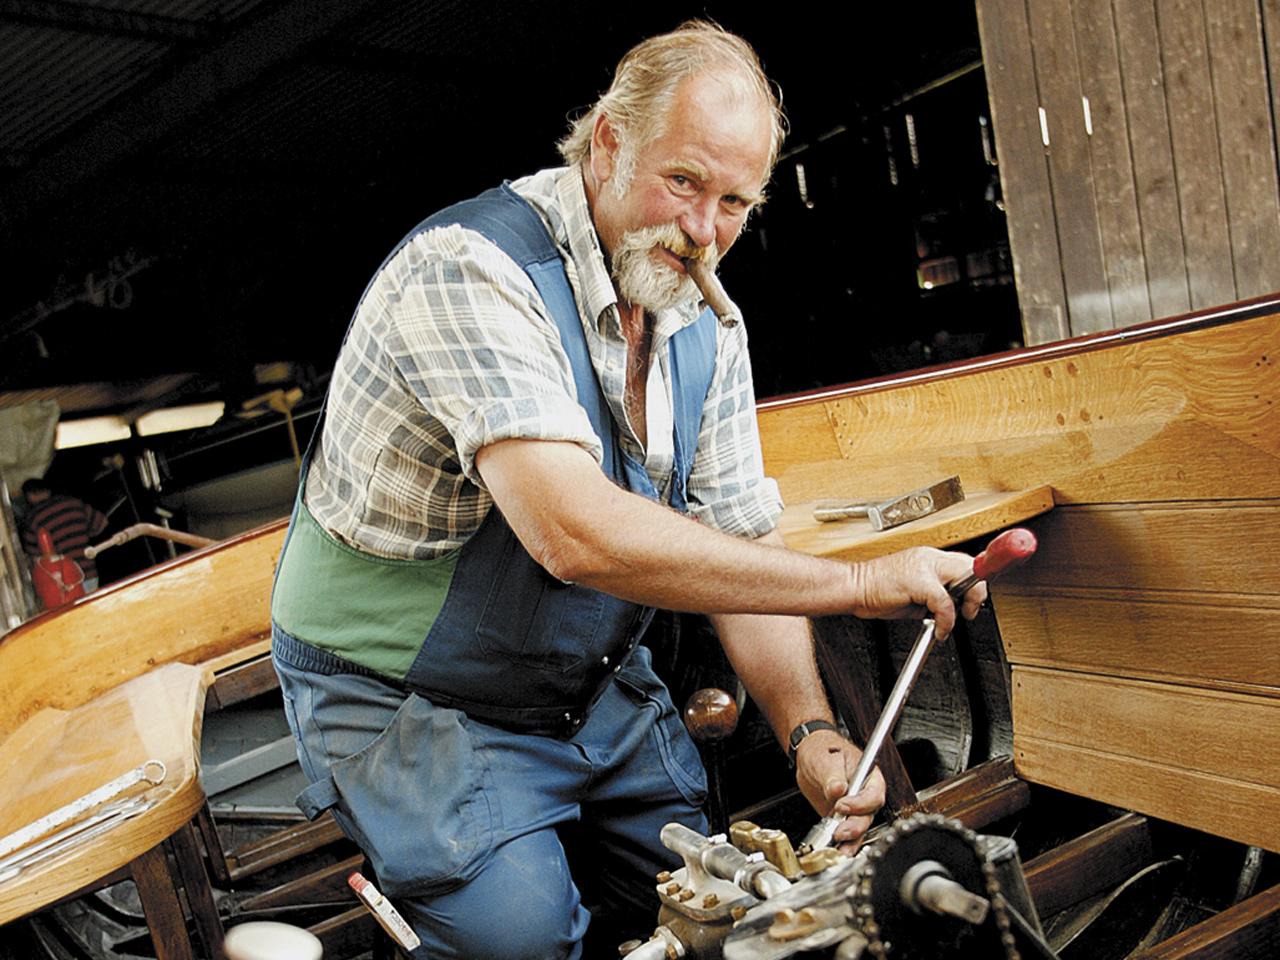 The boat builder at work (Foto: © Ulli Seer)